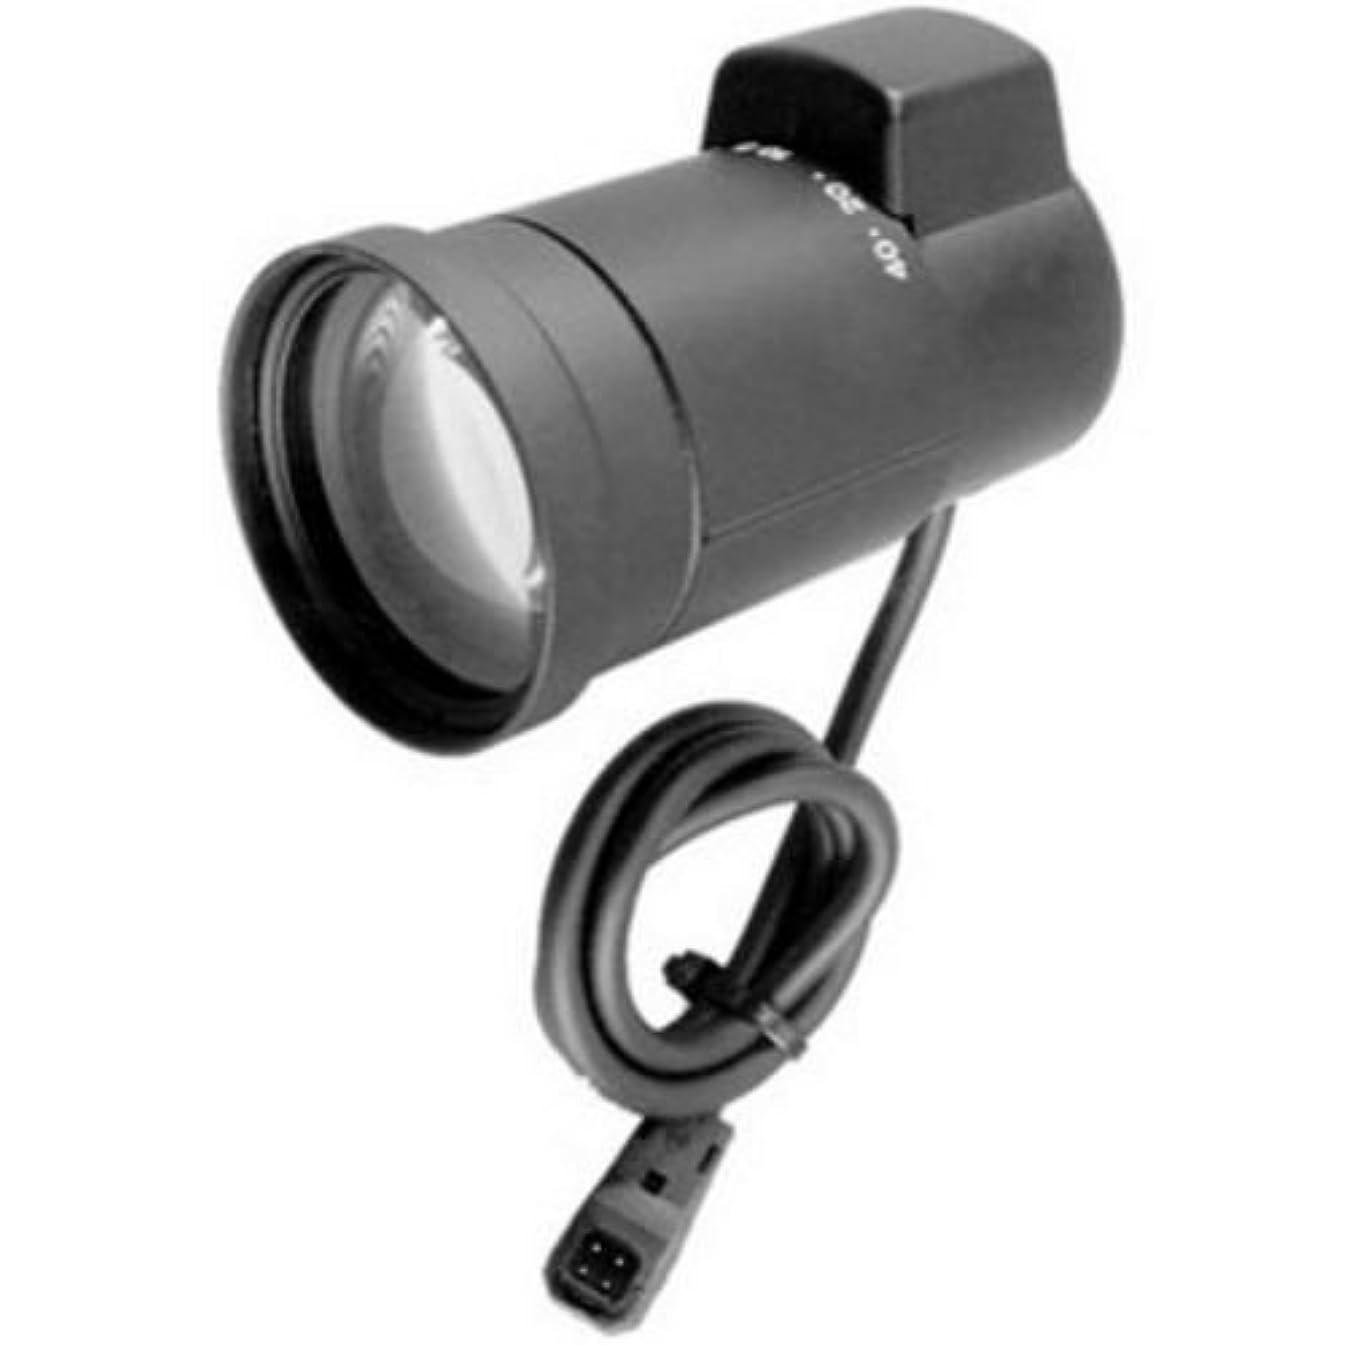 PELCO 13VD5-50 Varifocal Zoom Lens - 5mm to 50mm - f/1.4